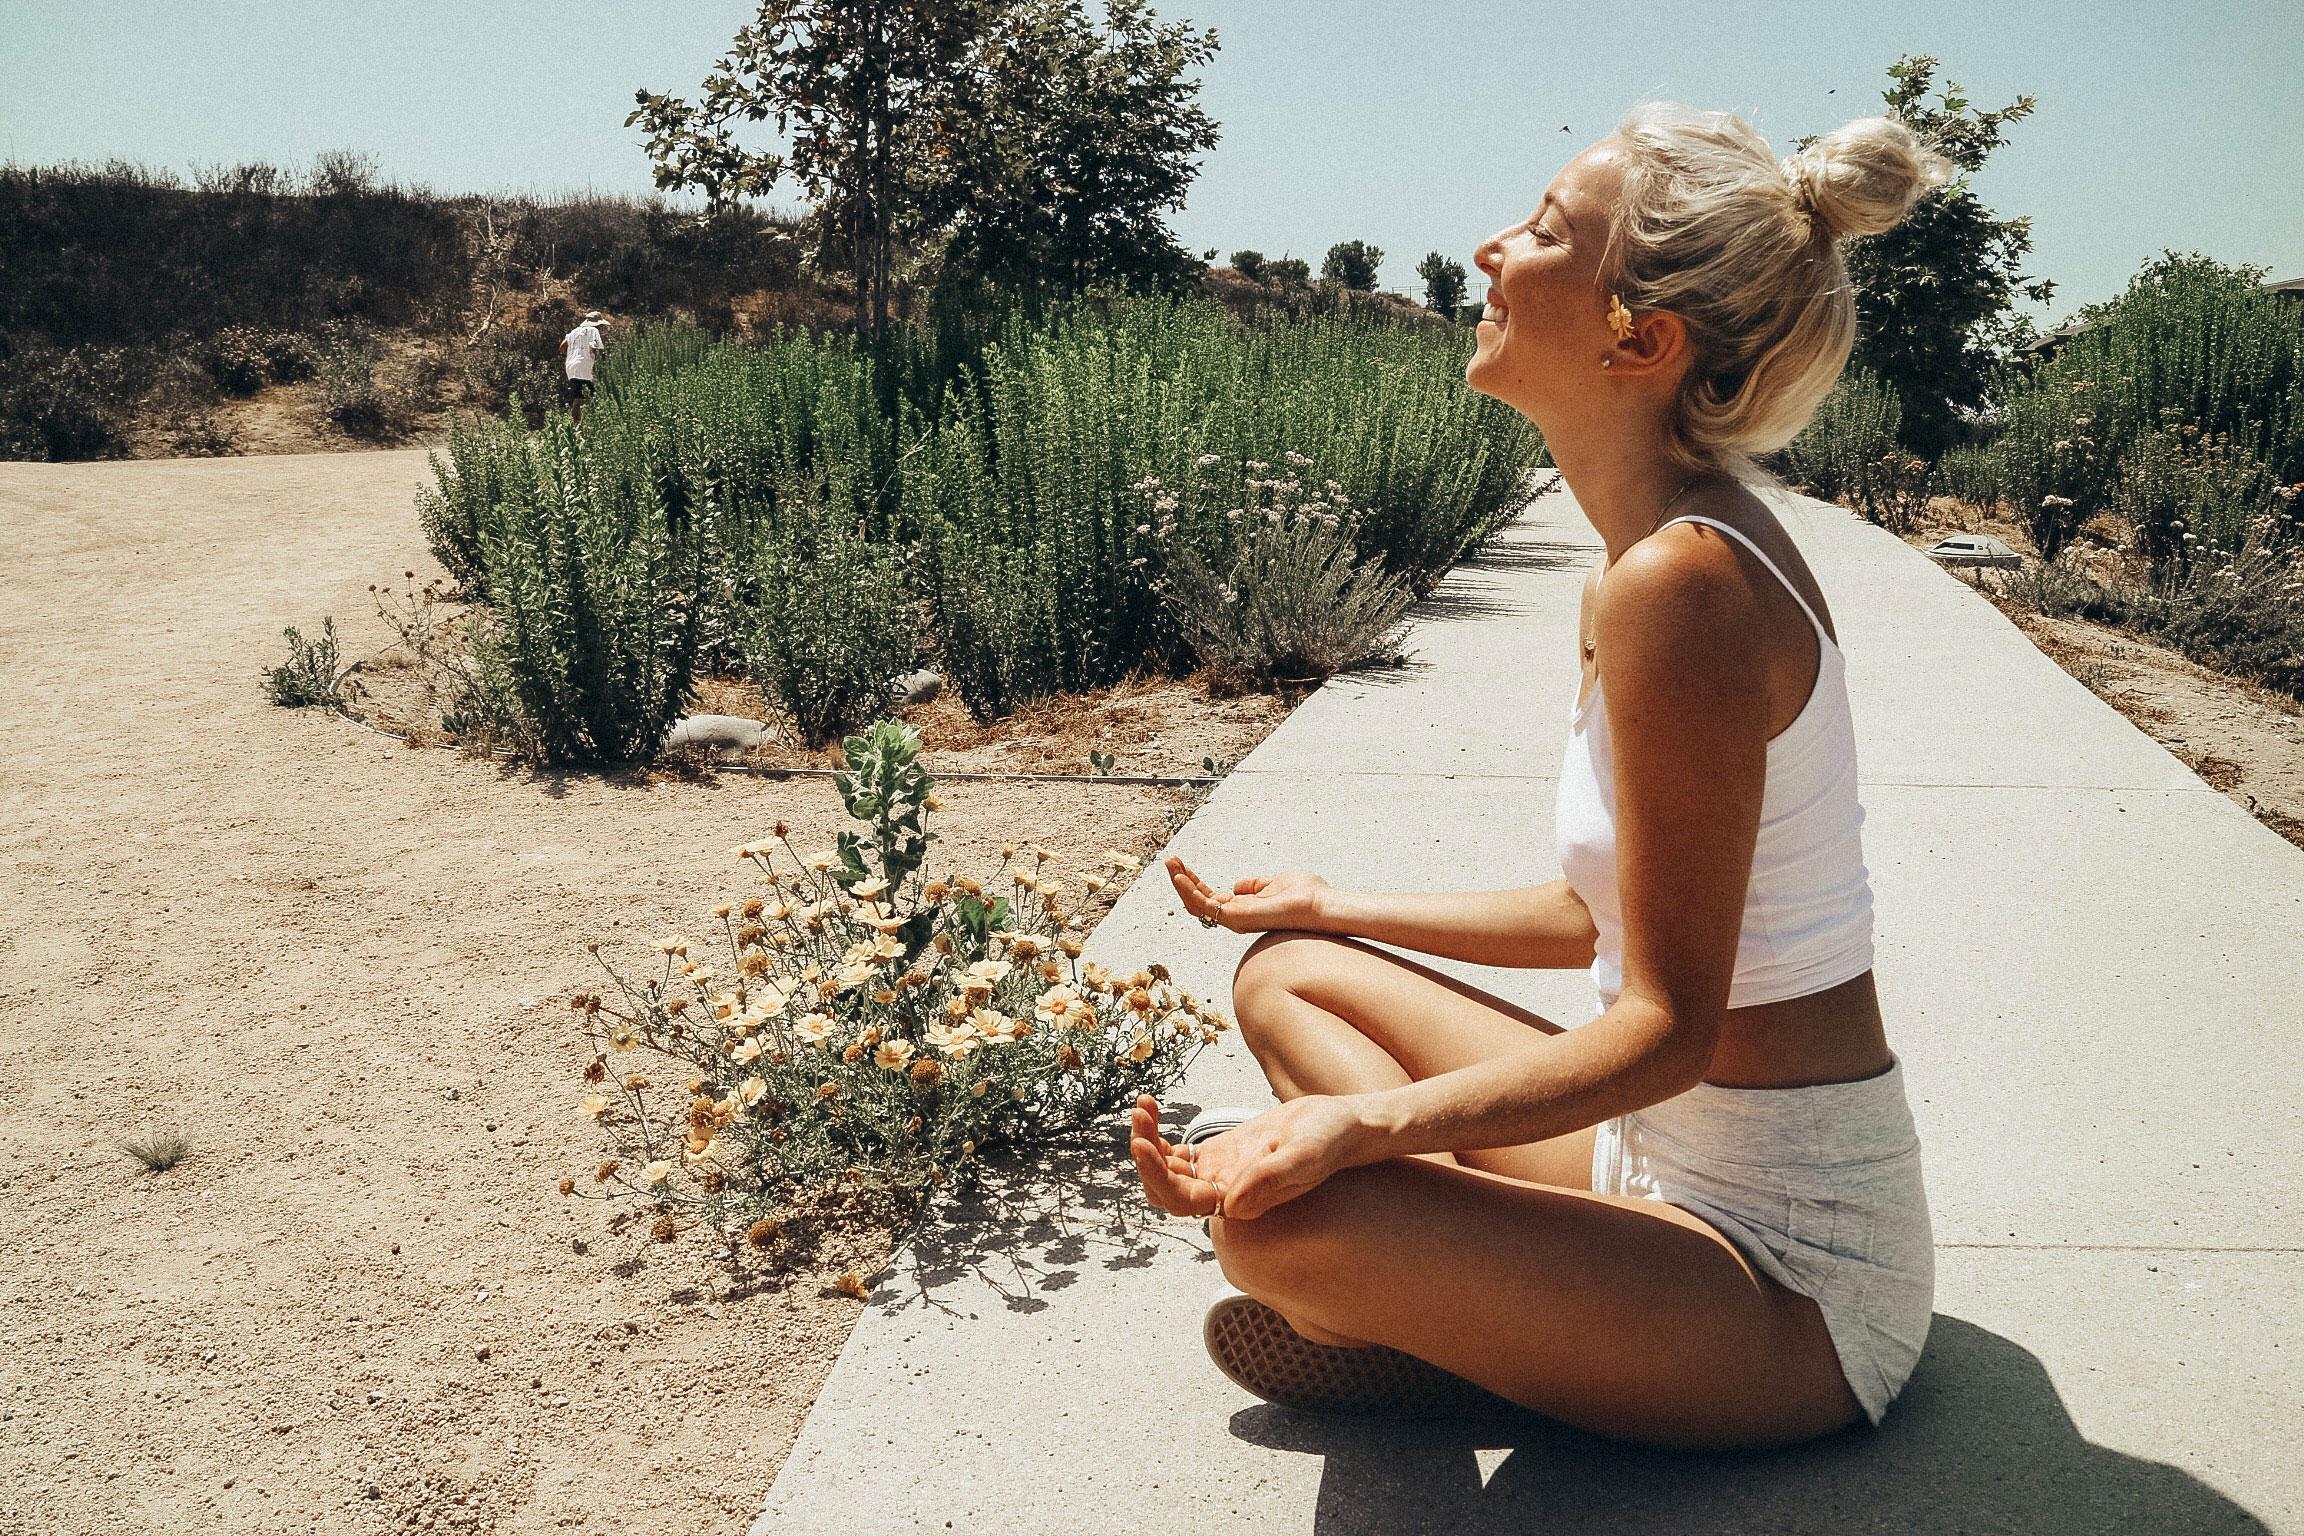 Ganja Yoga How to Combine Cannabis and Yoga4 Ganja Yoga: How to Combine Cannabis and Yoga